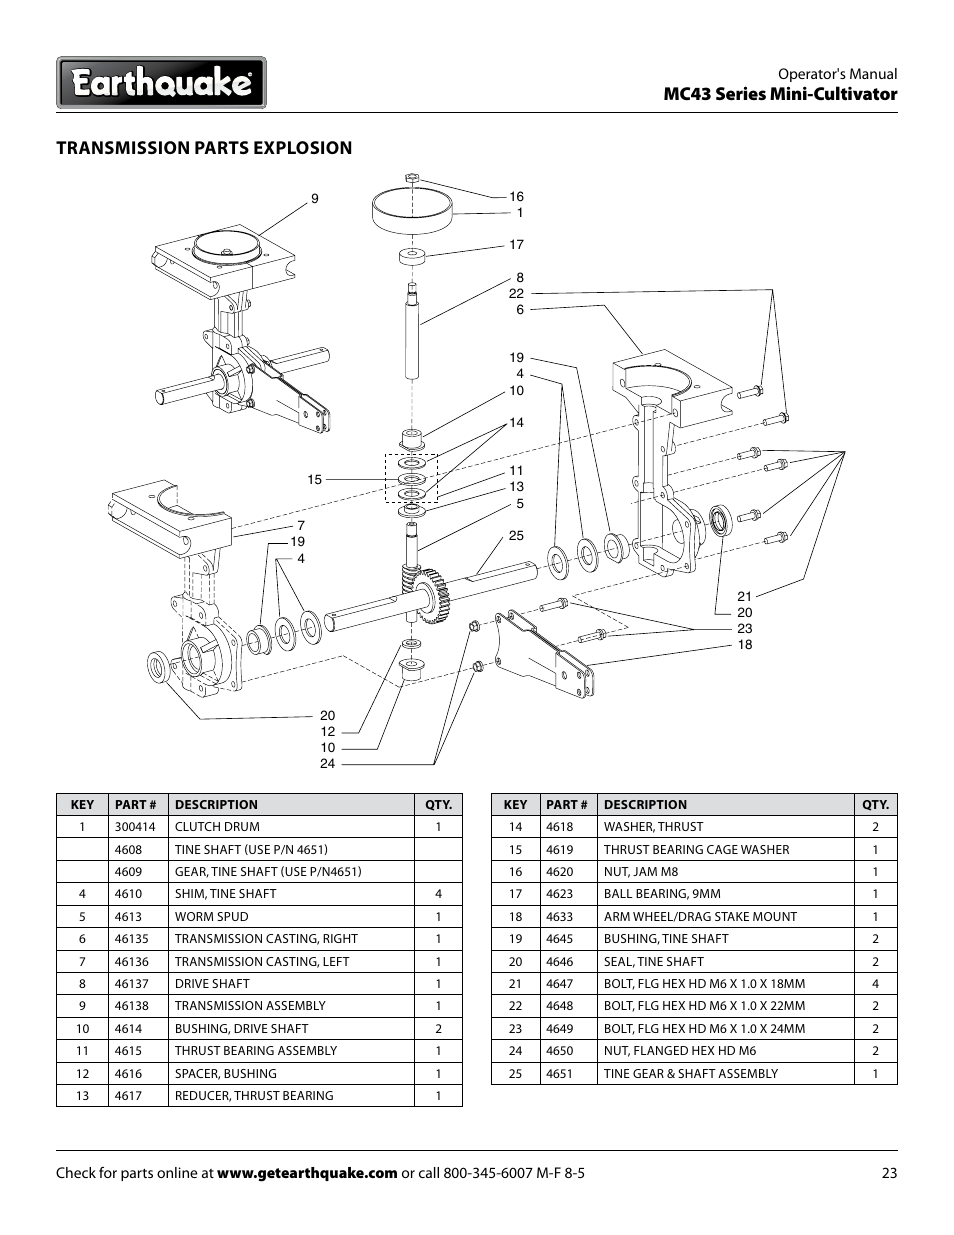 hight resolution of mc43 series mini cultivator transmission parts explosion earthquake mc43e user manual page 23 32